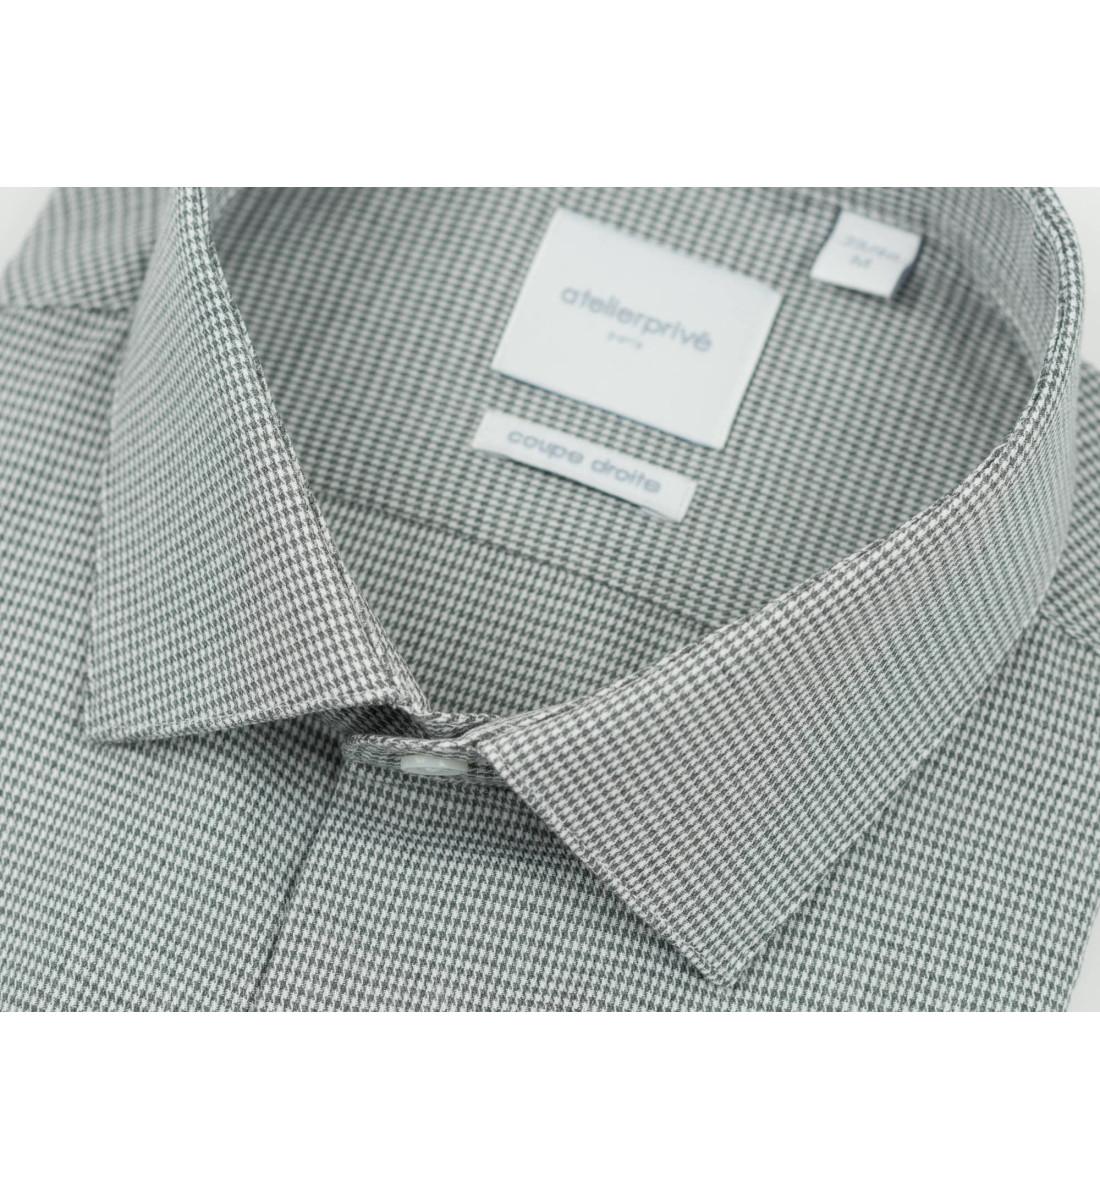 Chemise coupe droite TEOPHILE gris